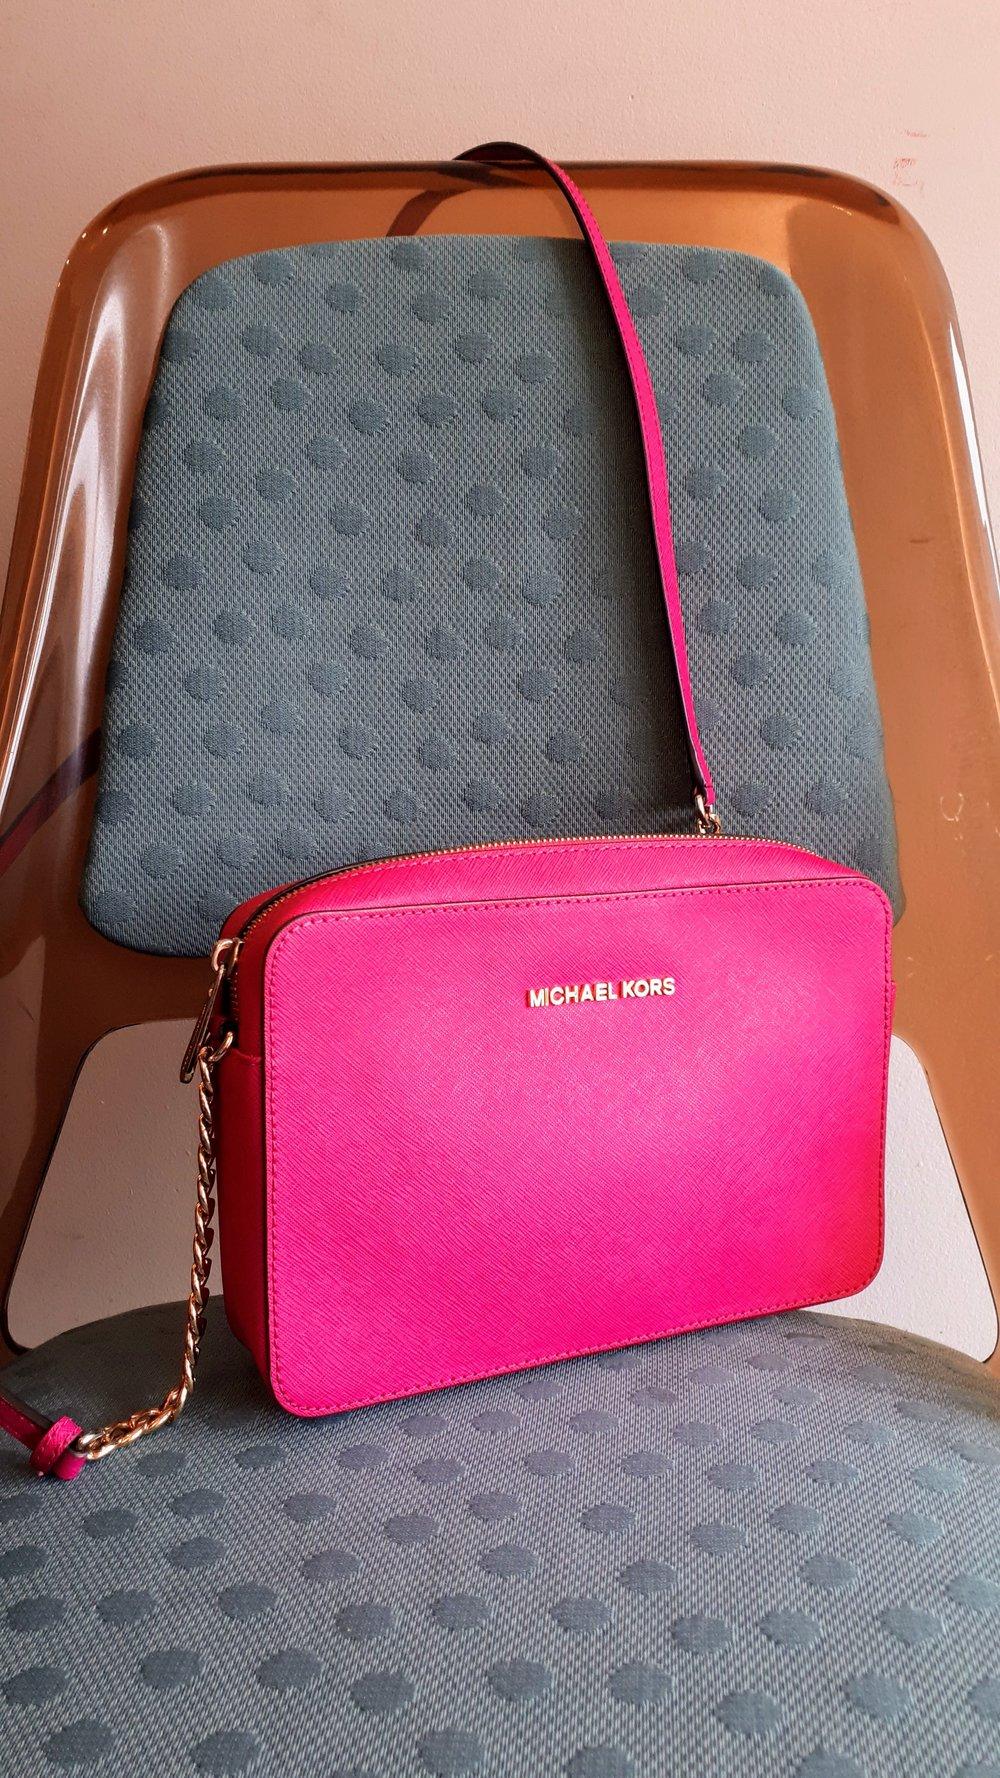 Michael Kors purse, $72